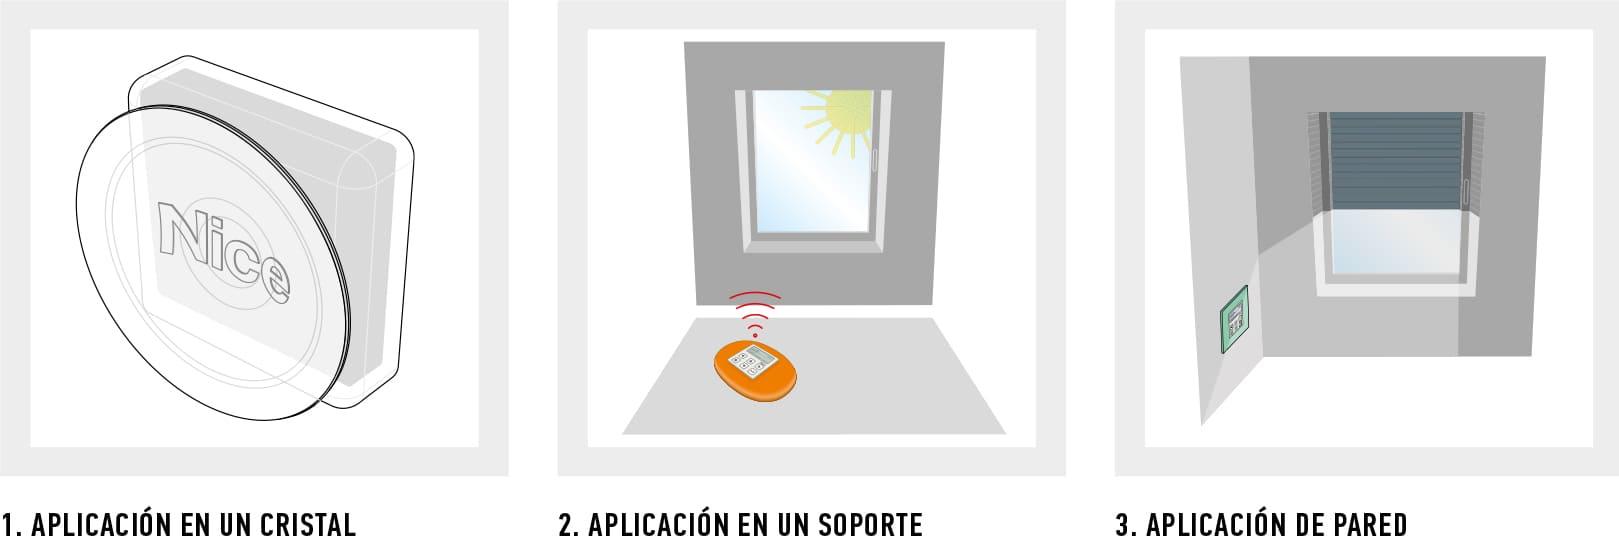 ejemplo-1